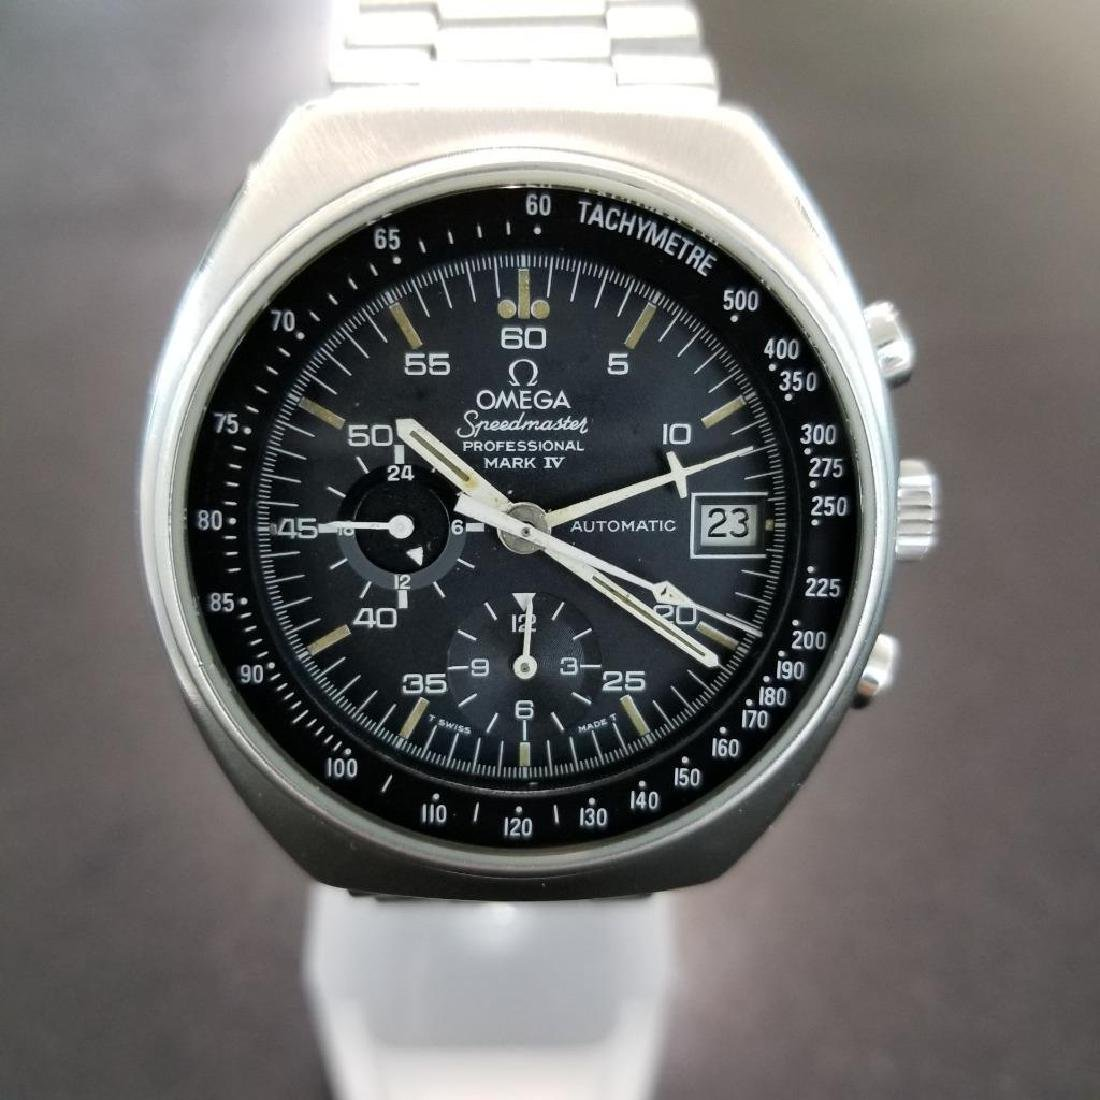 Omega Speedmaster Mark IV 1970s Professional - 3